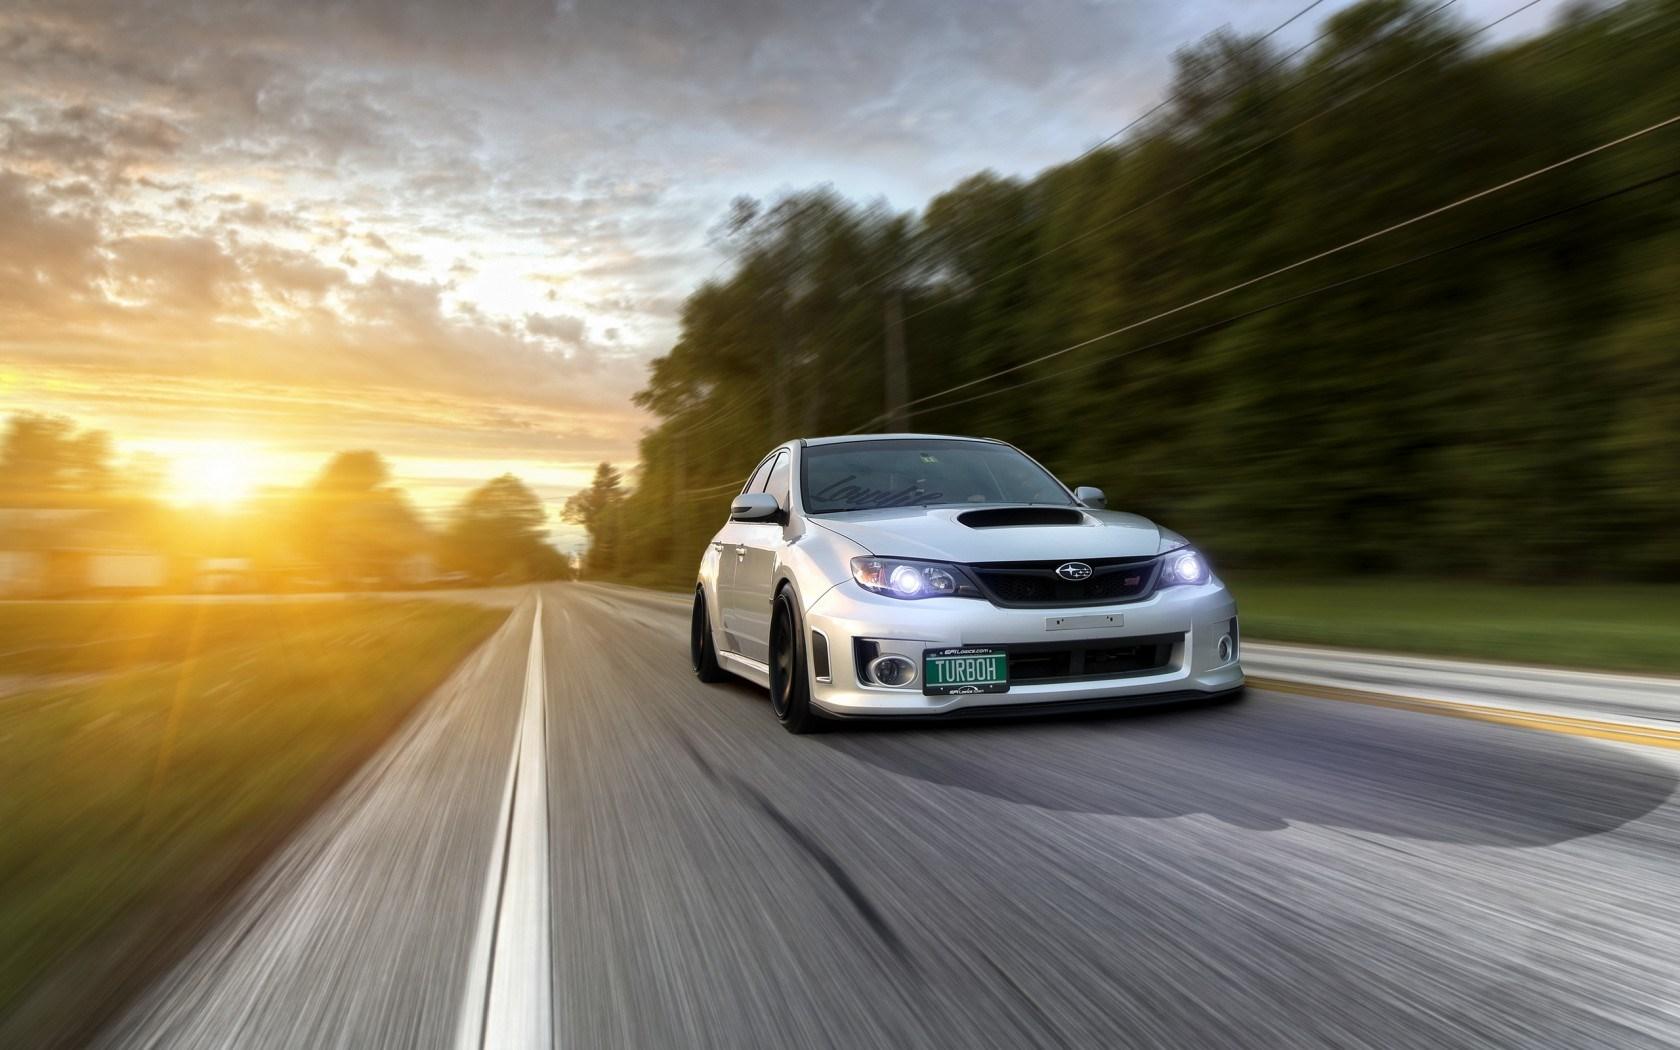 Subaru Impreza Wallpaper and Background 1680x1050 ID